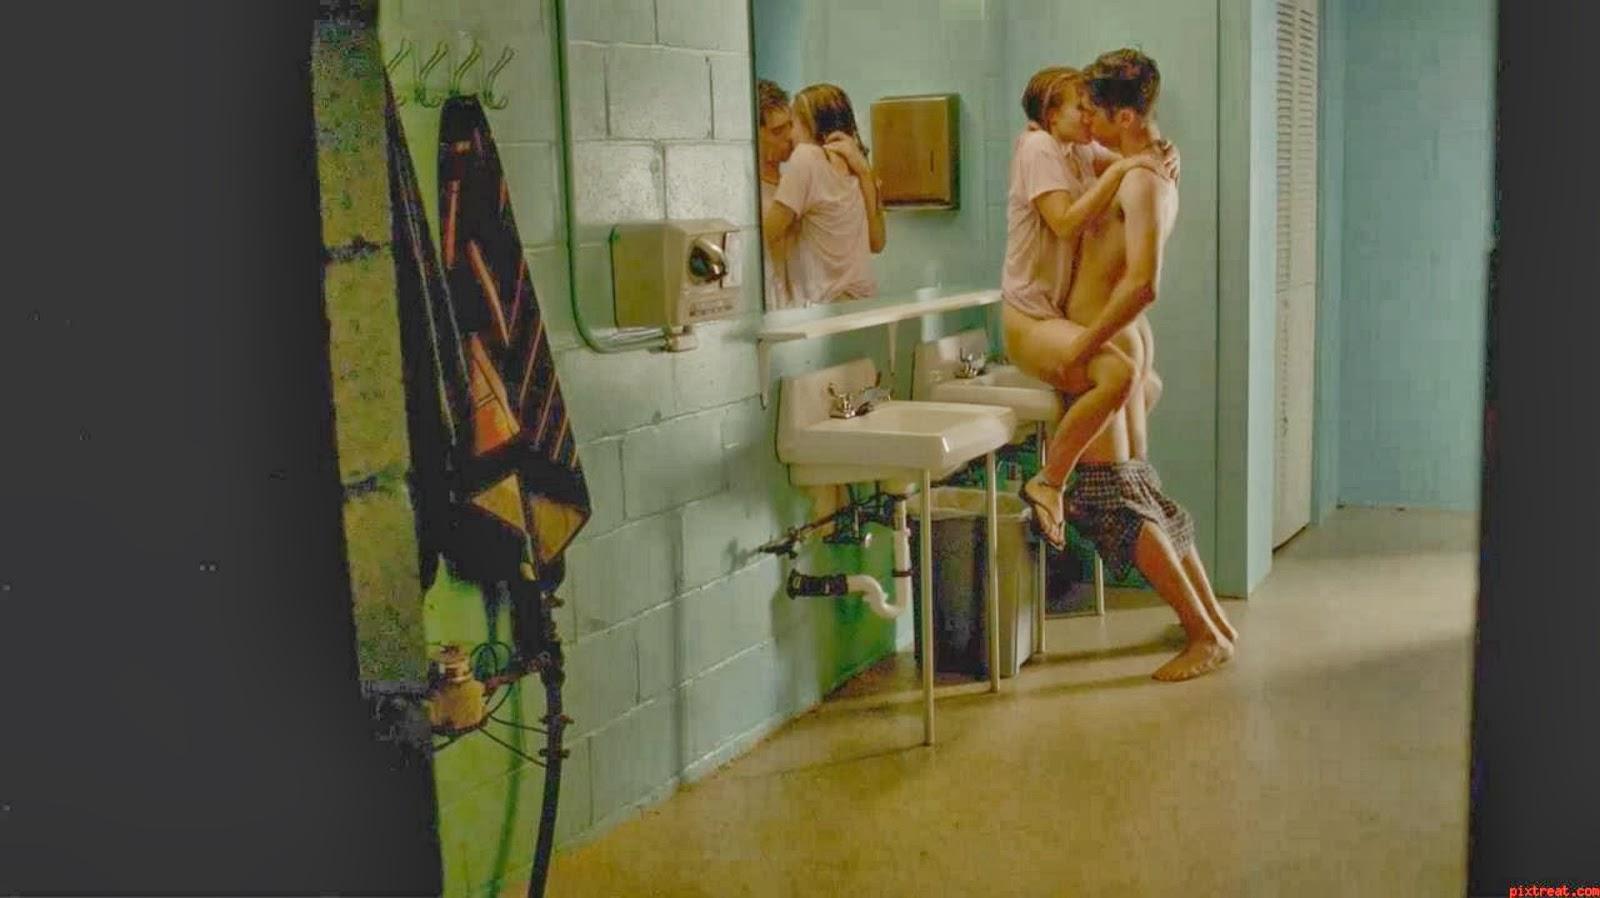 tumblr twin girls naked